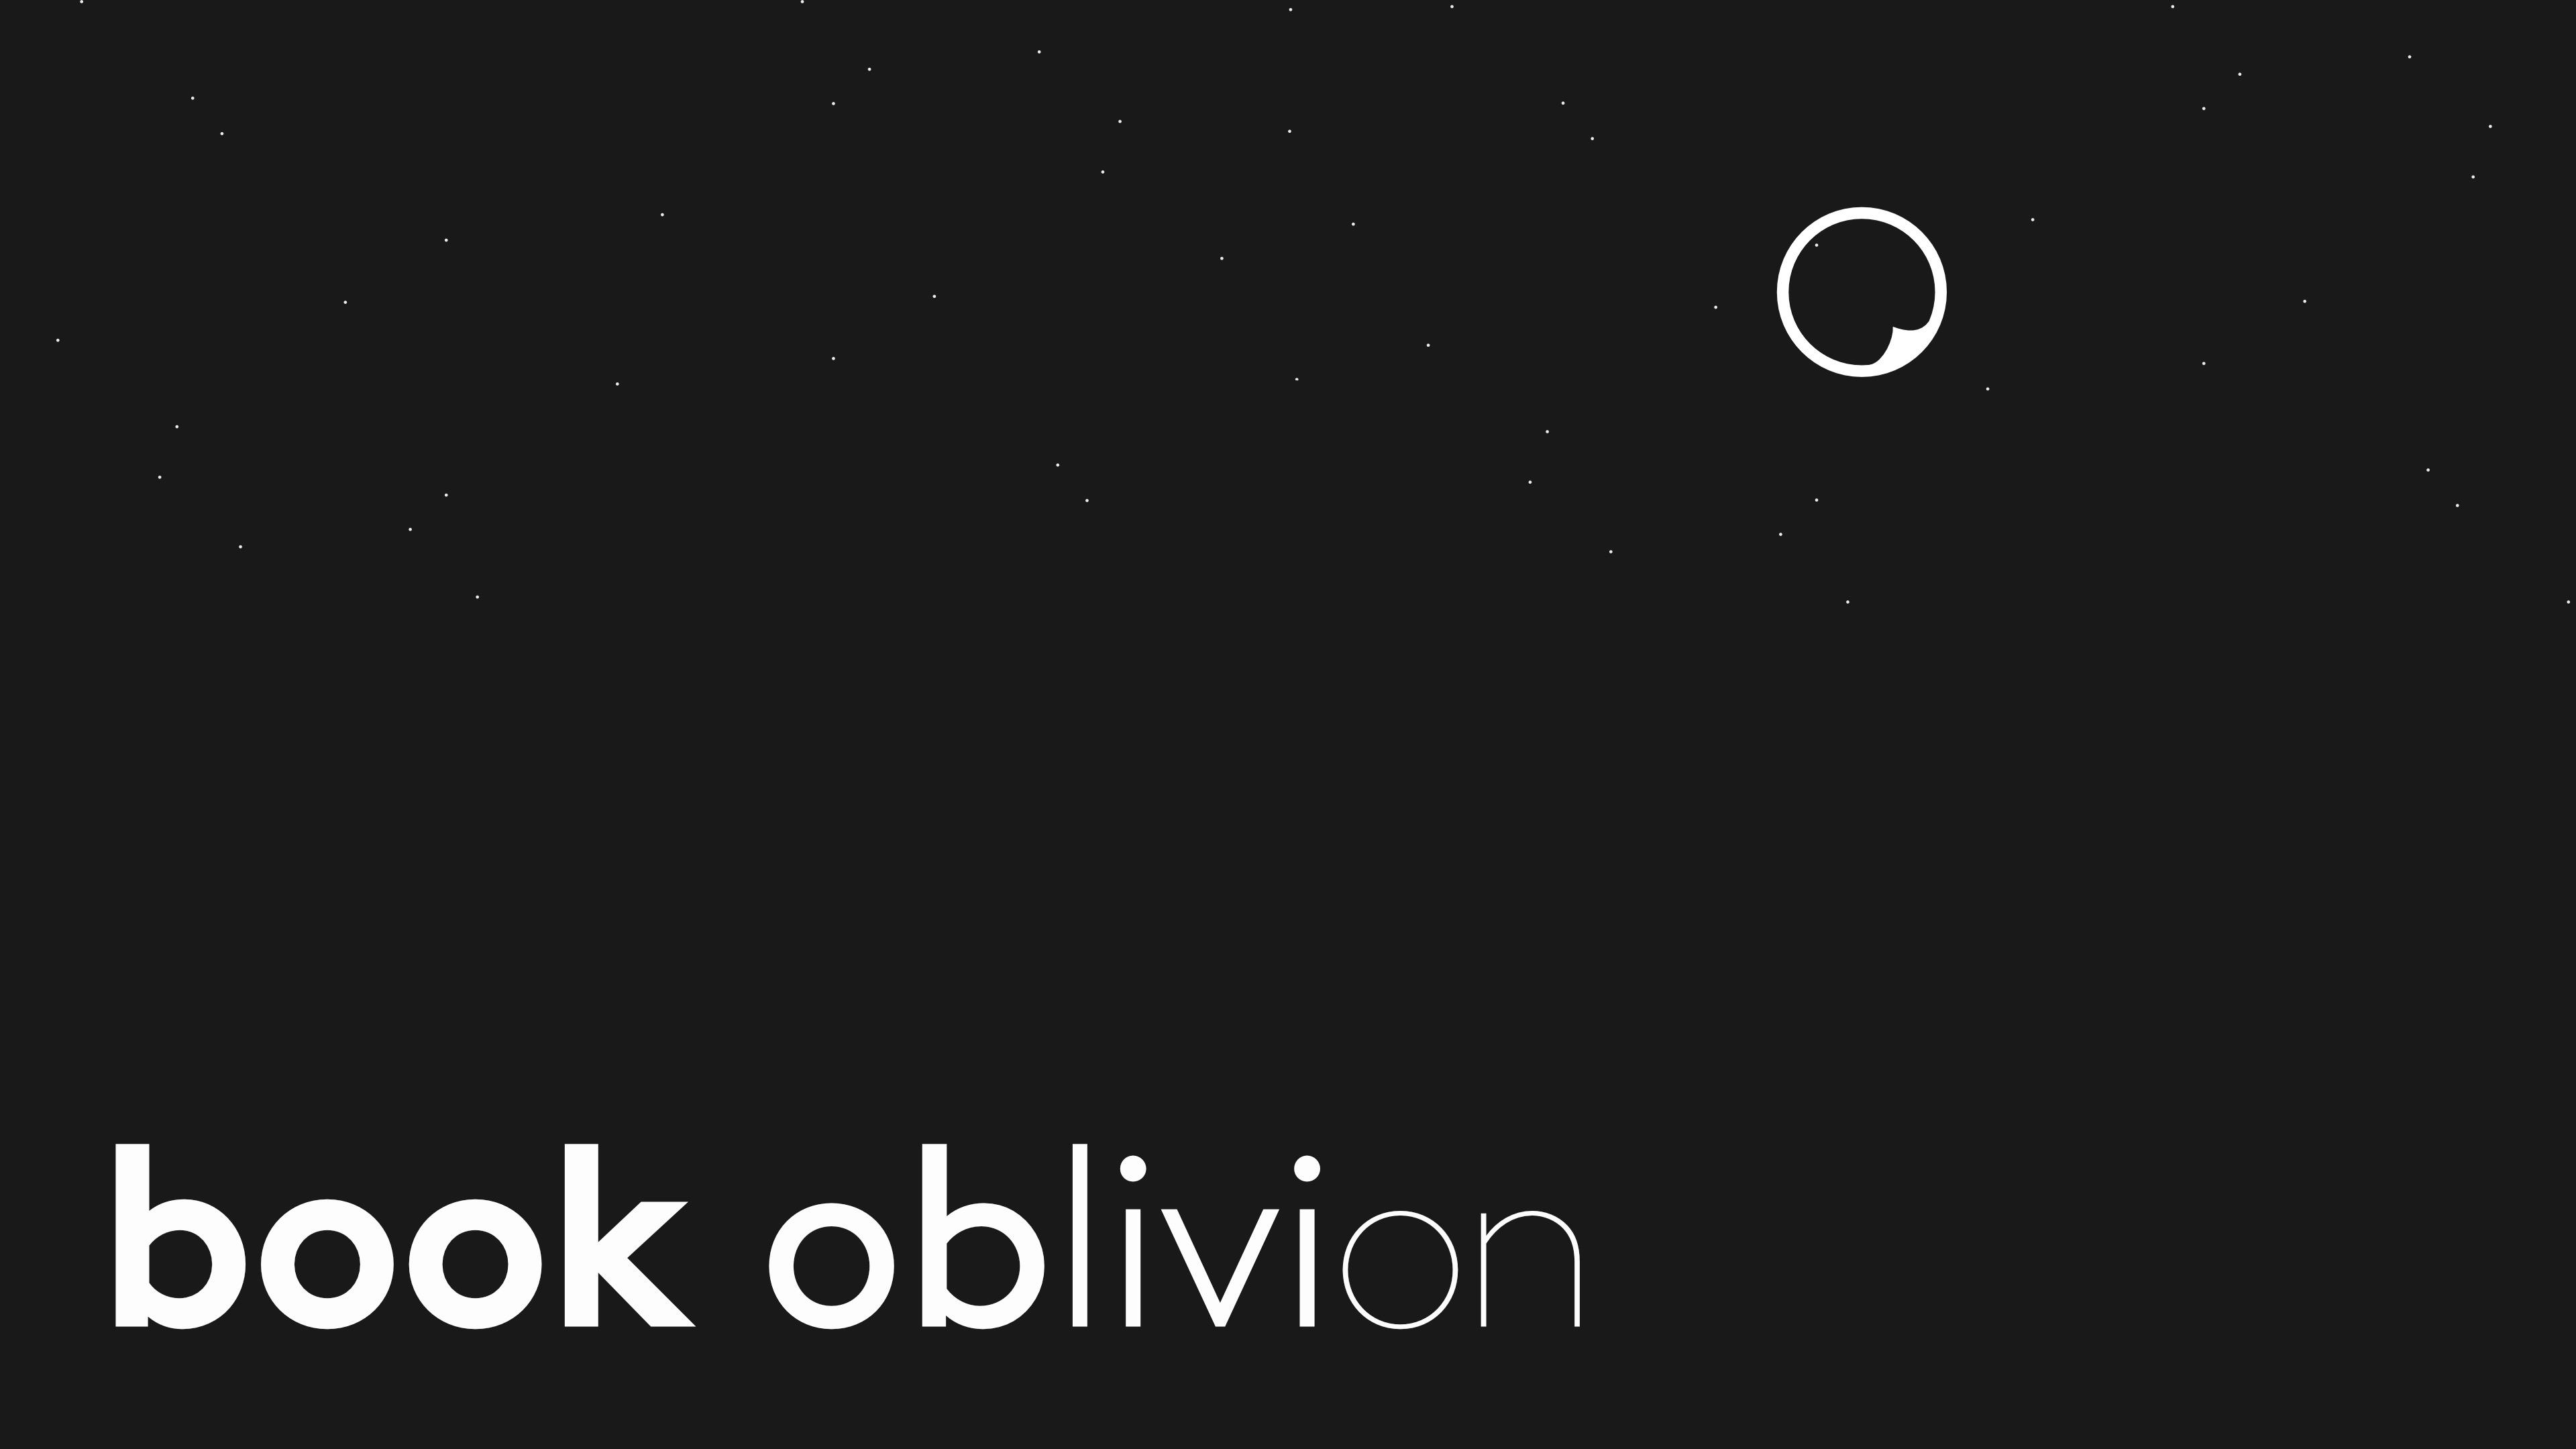 Book Oblivion